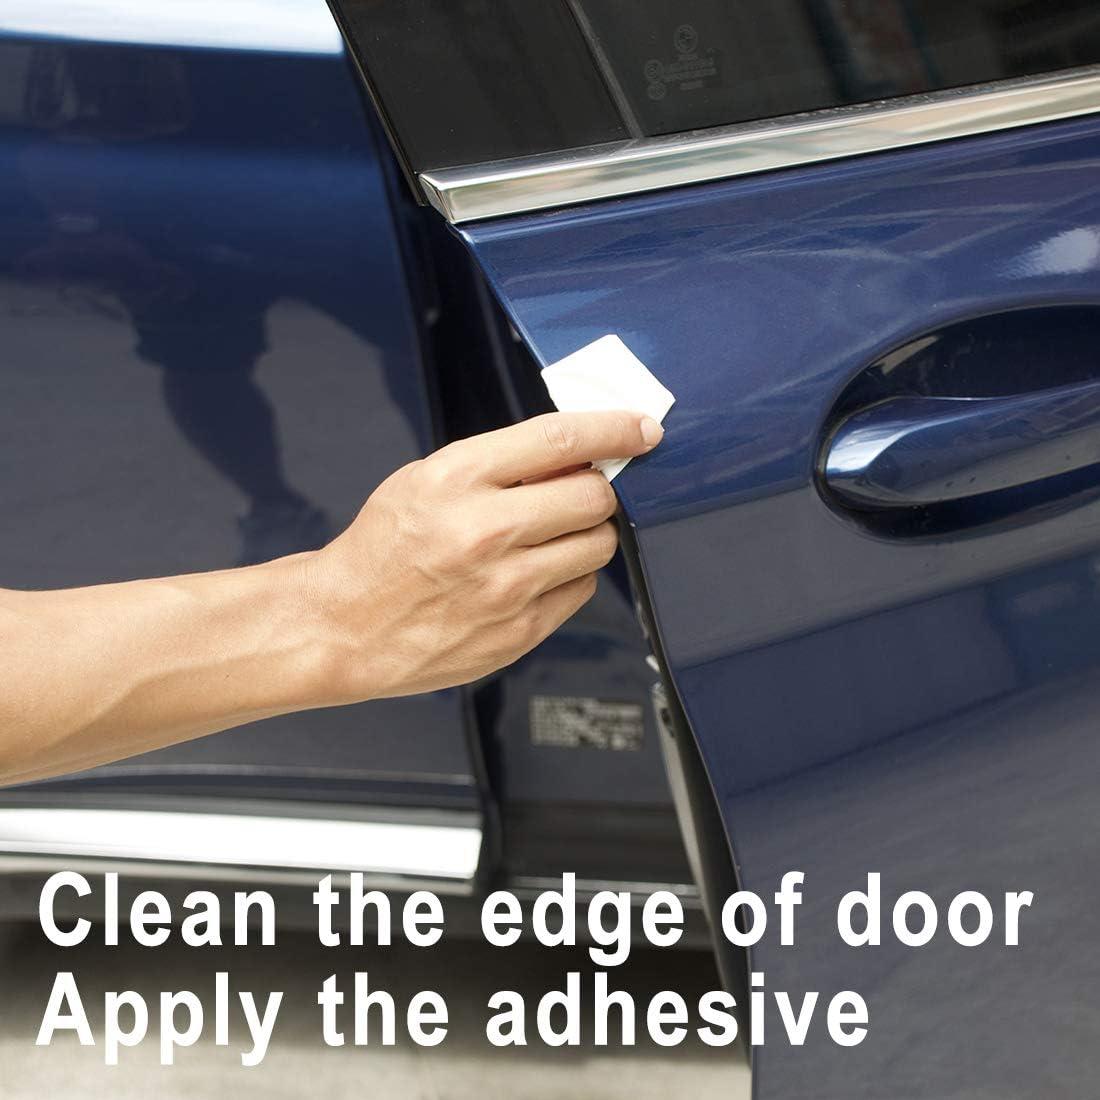 Auto Door Trim Molding 20ft Maremlyn Door Edge Guard U-Shaped Car Edge Trim Rubber Seal Door Edge Protector Fits for Most Car 6m